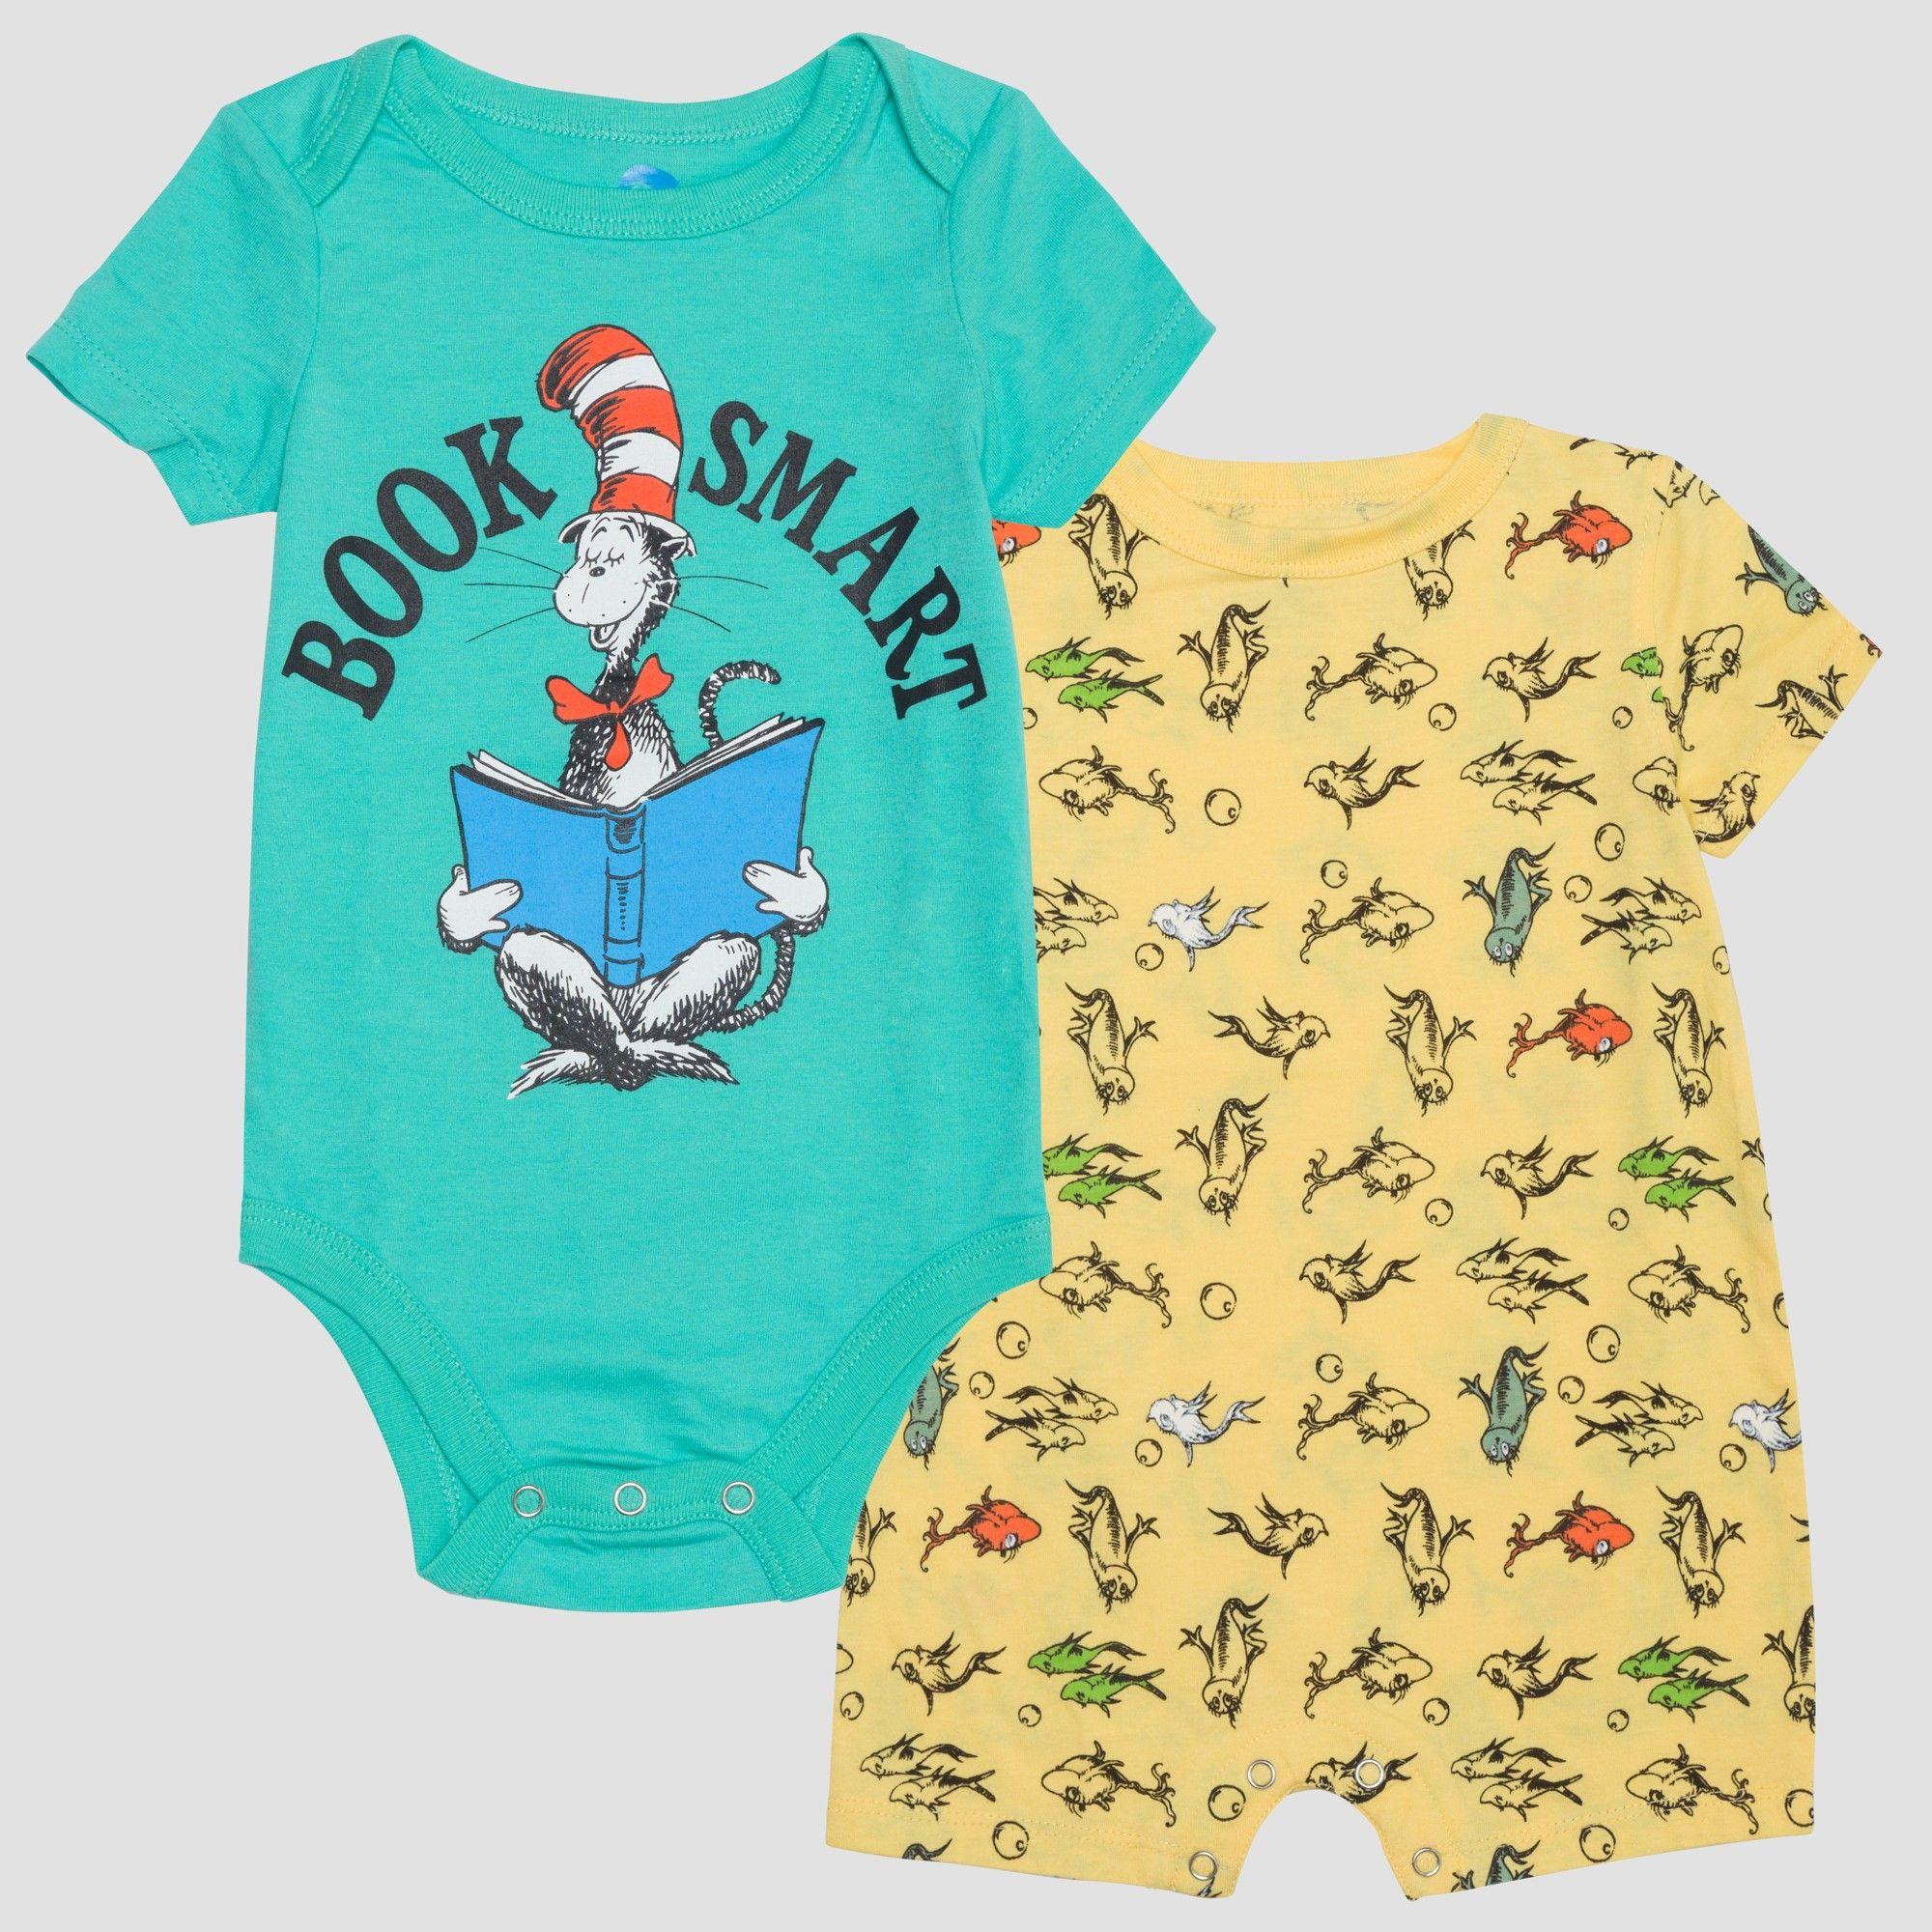 003c0770e2c10 Dr. Seuss Baby Boys  2pk Short Sleeve Bodysuits - Yellow Aqua NB ...